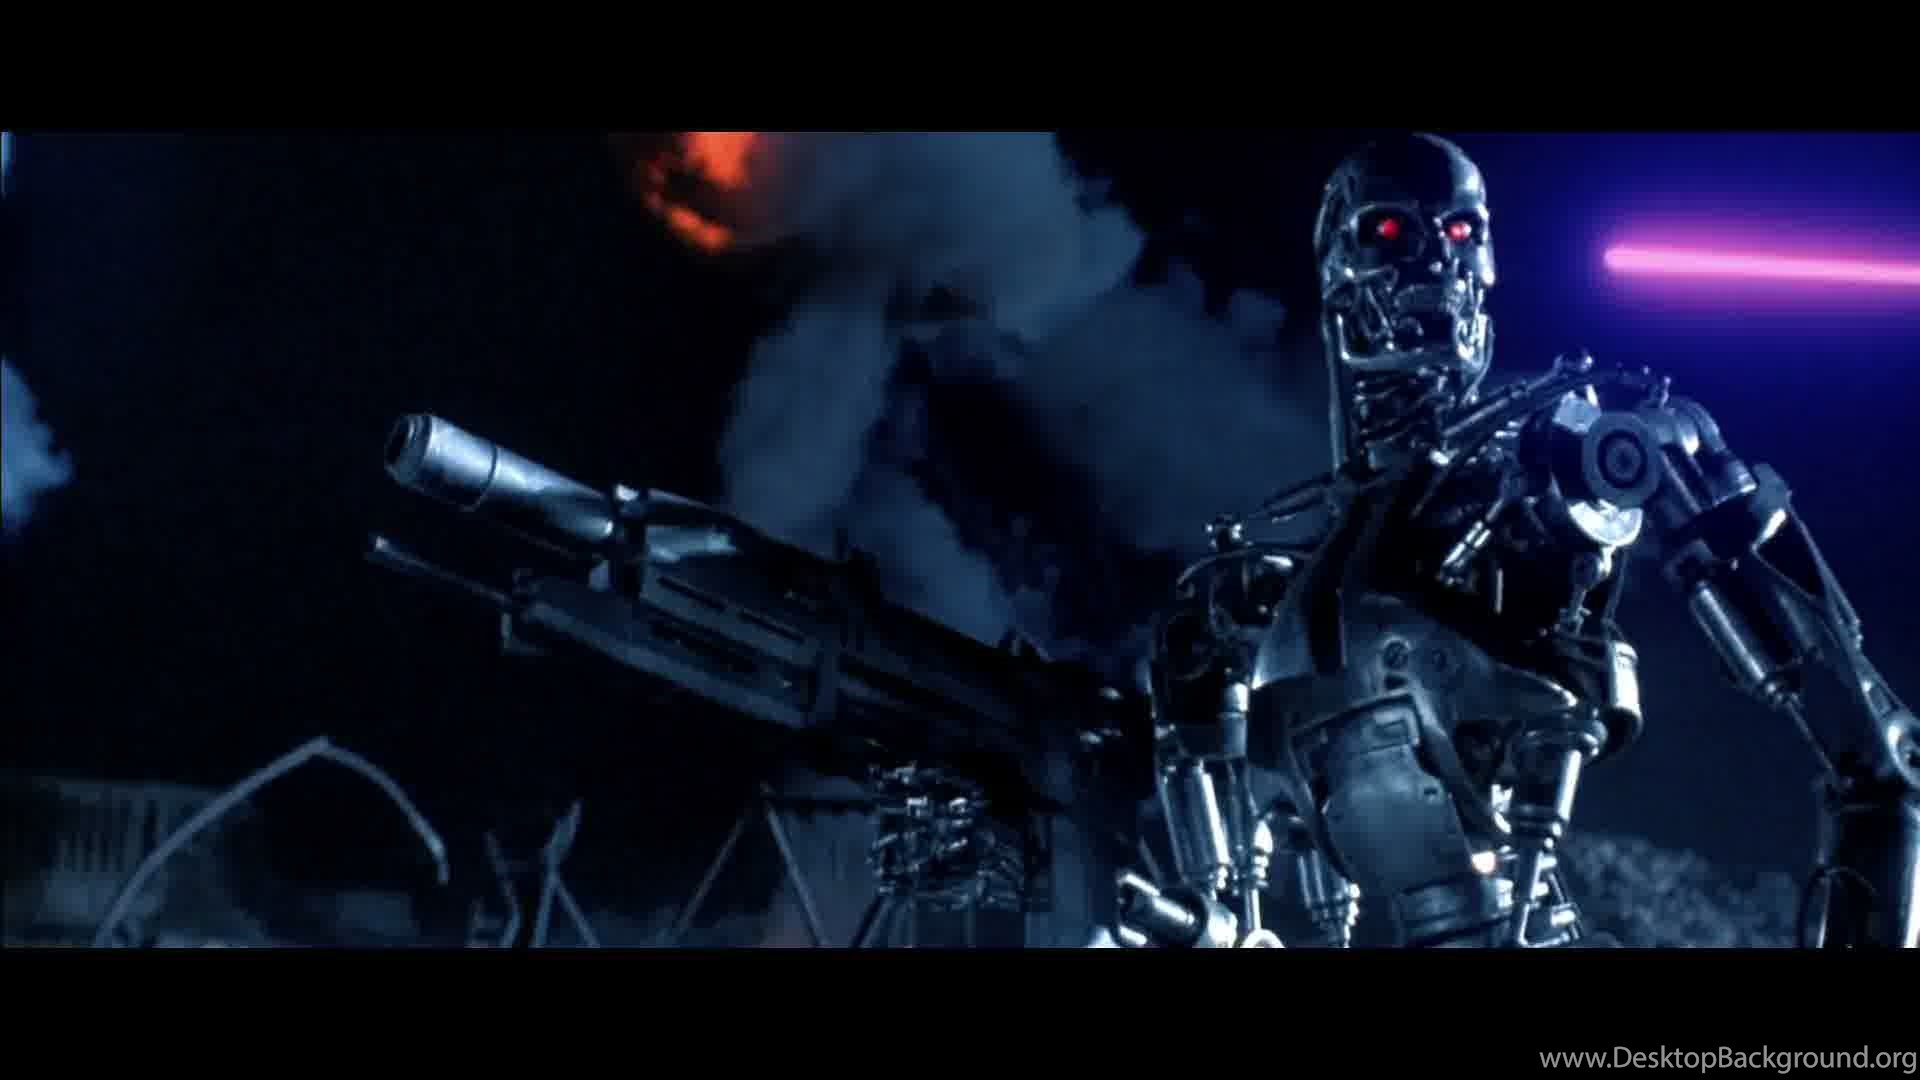 38 terminator wallpapers 1603 terminator desktop wallpapers desktop background - Terminator 2 wallpaper hd ...